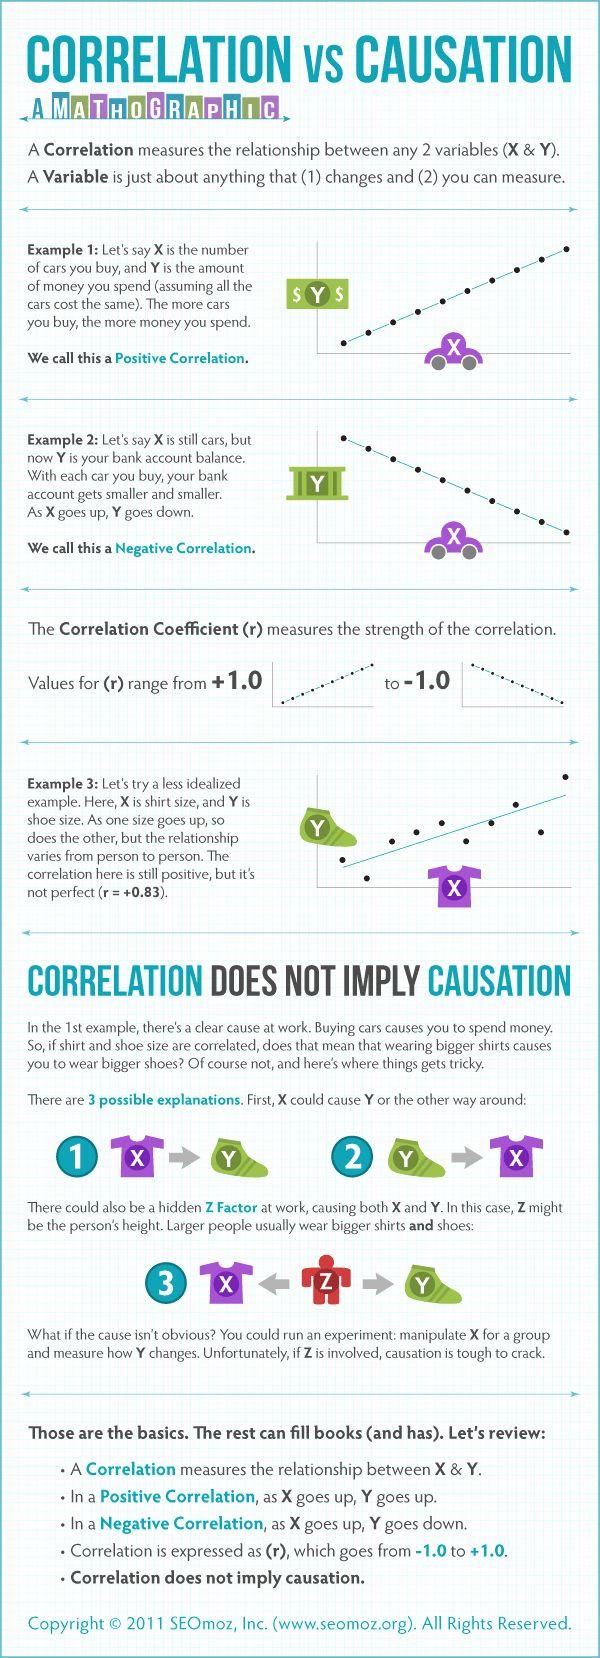 Correlation Vs Causation Worksheet Correlation Vs Causation Worksheet New Fjhs Algebra 1